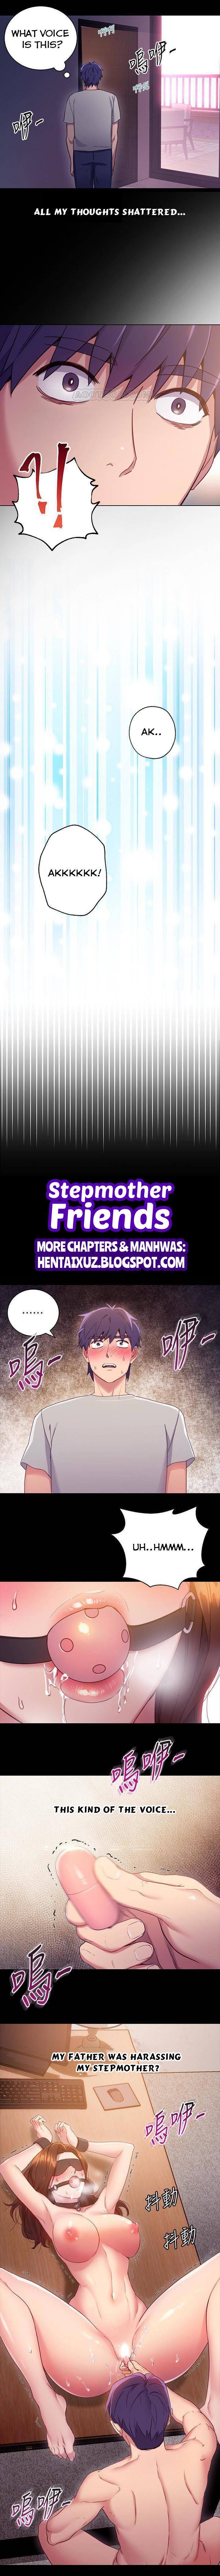 [Neck Pilllow] Stepmother Friends Ch.40/? [English] [Hentai Universe] NEW! 22/10/2020 101